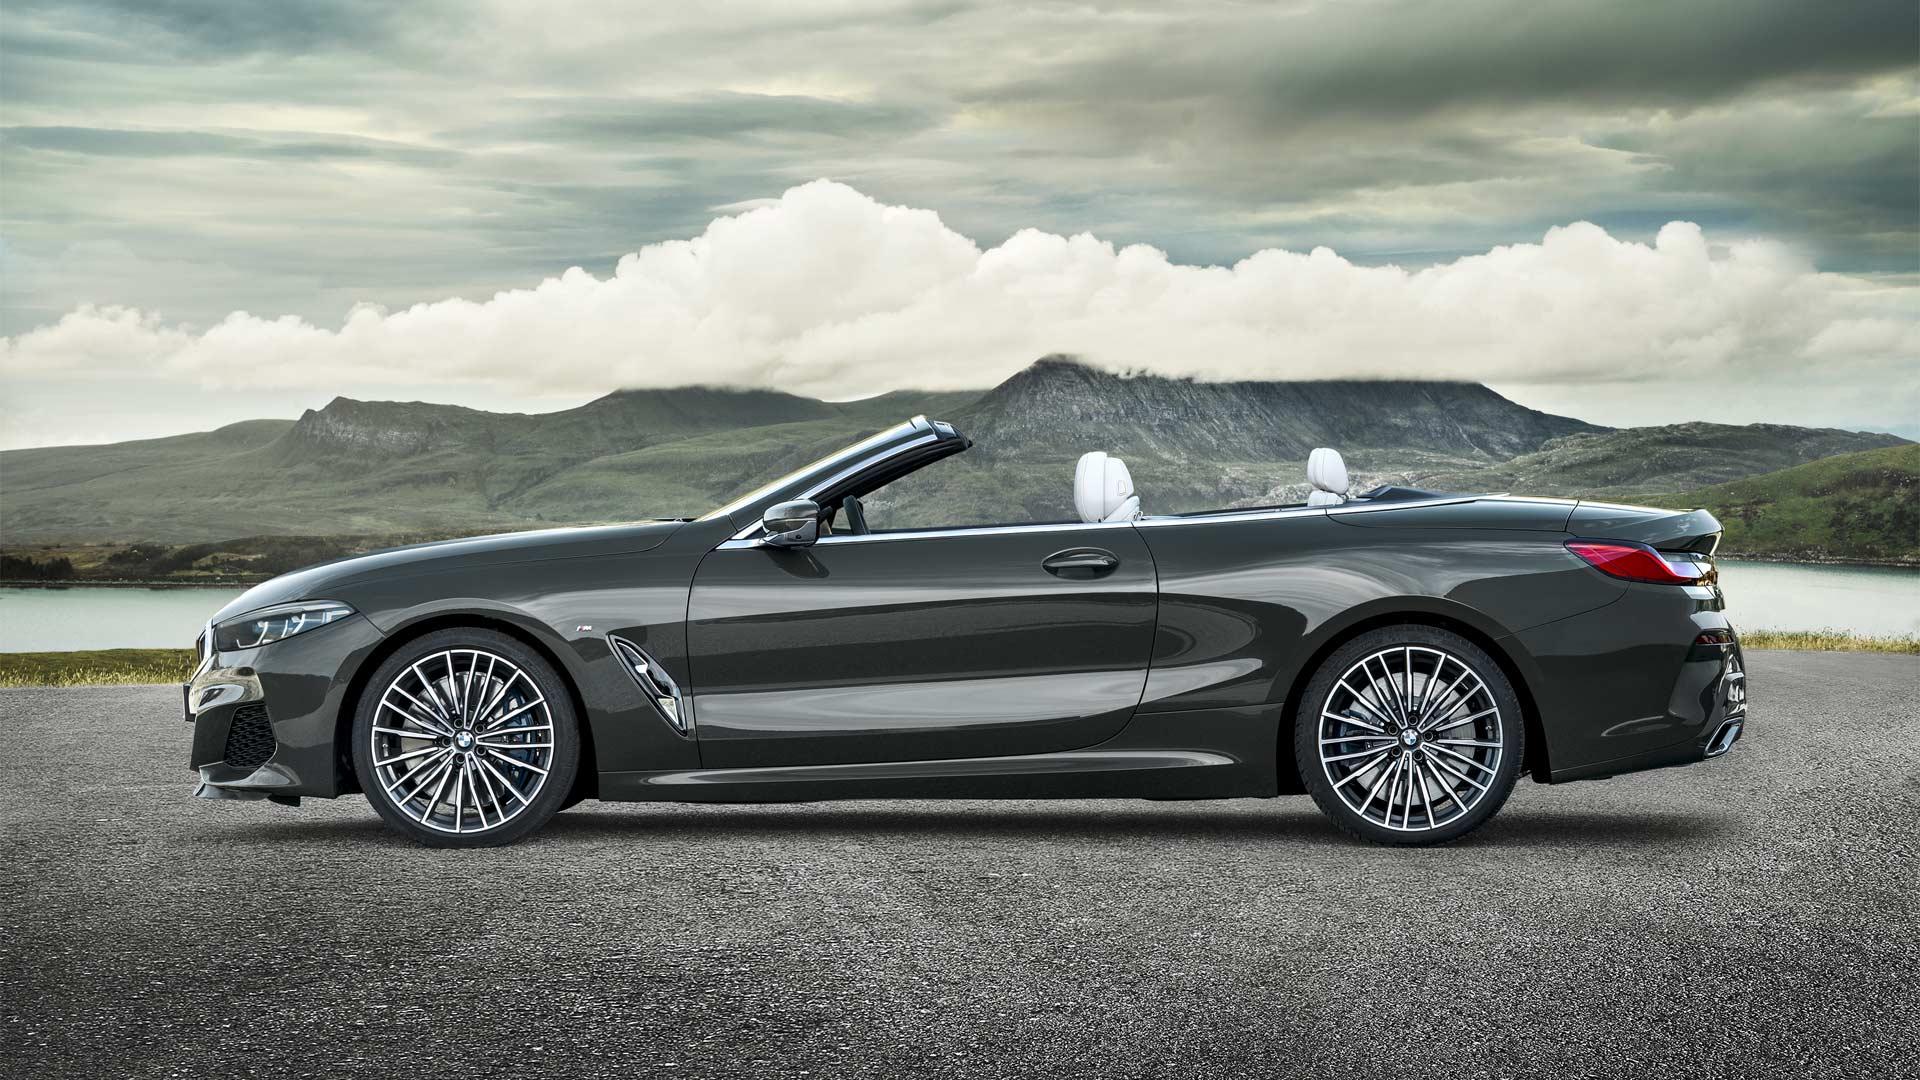 2019-BMW-8-Series-Convertible_6